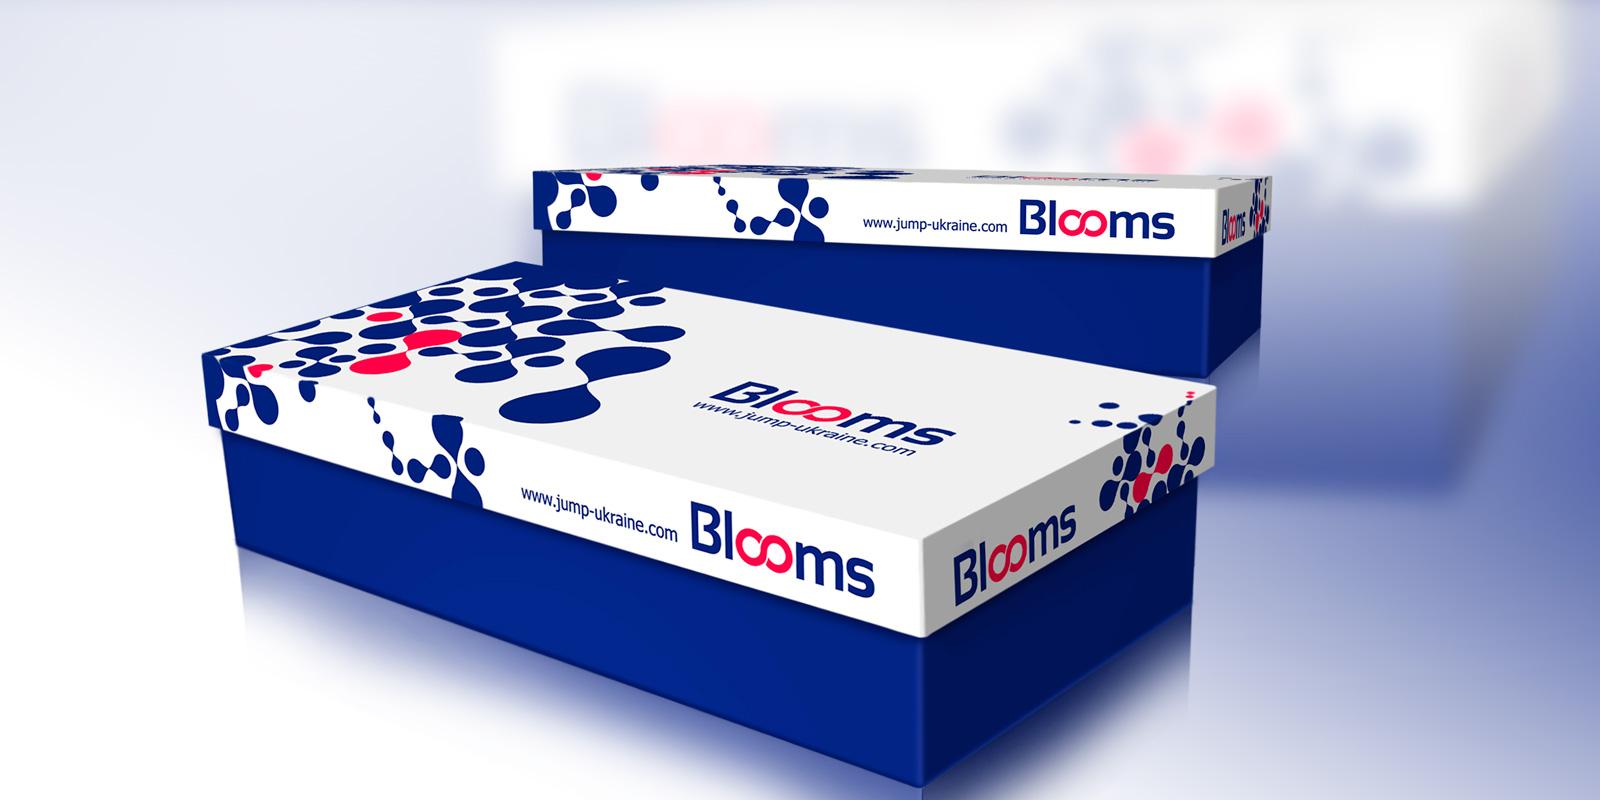 TM Blooms;;;;;;Разработка упаковки;;;;;;<span>Клиент:</span> TM Blooms;;;;;;;;;;;;Разработка упаковки;;;;;;2